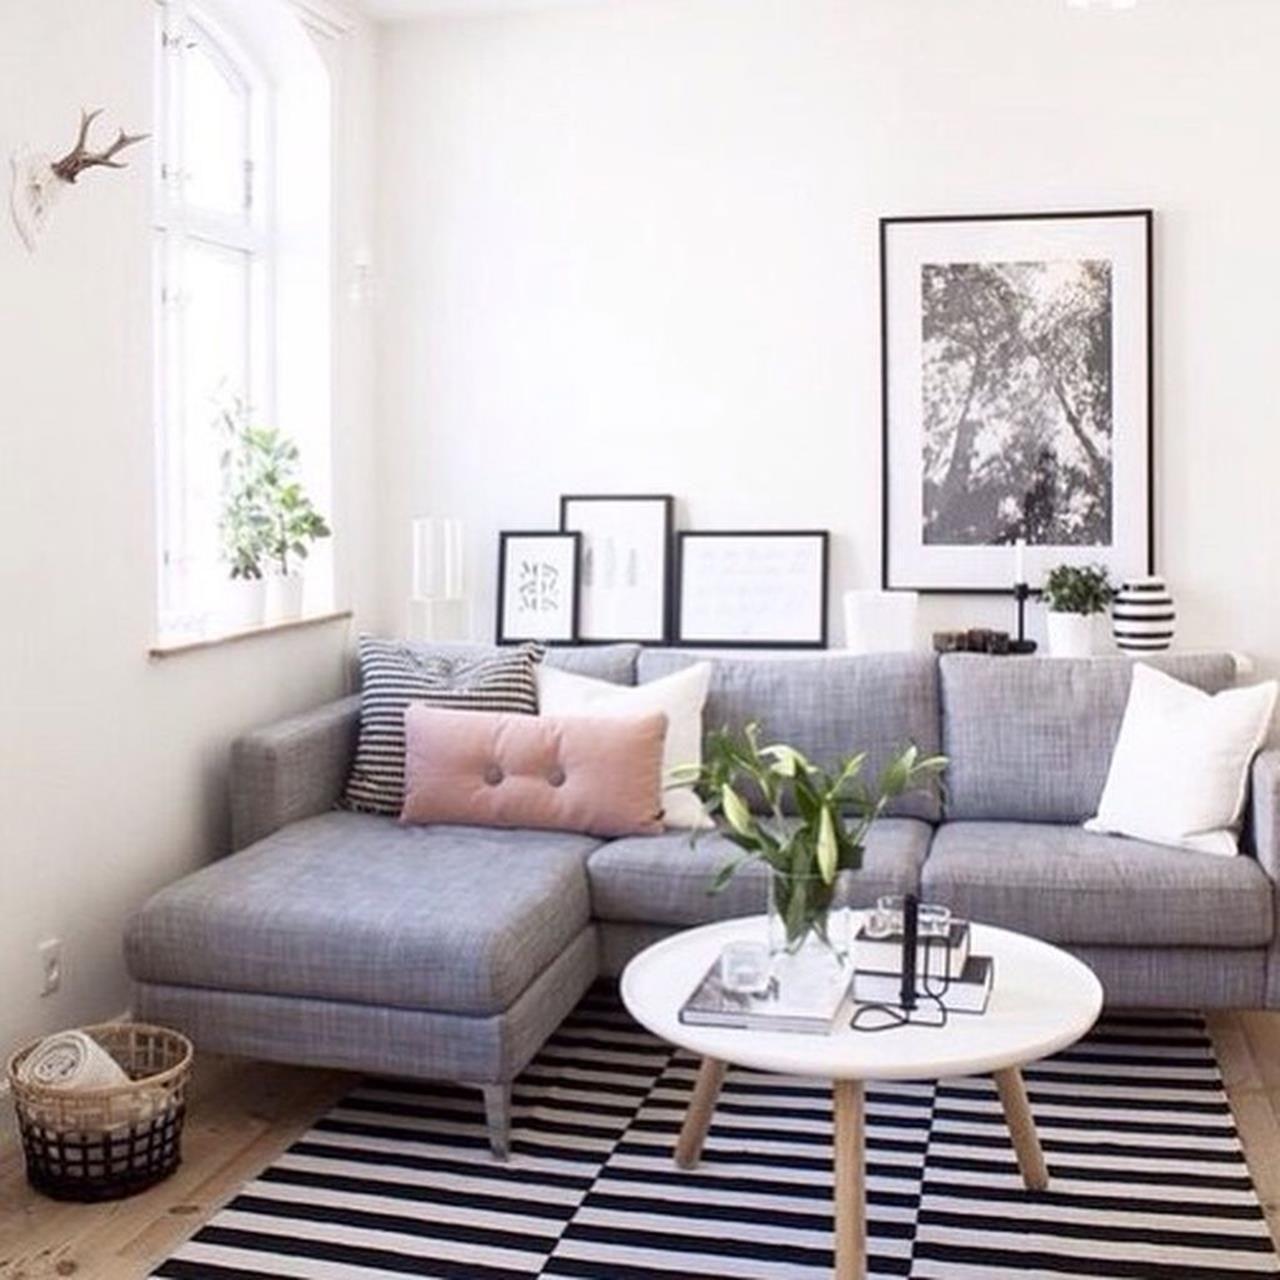 19 elegant small apartment decorating ideas apartments decorating rh pinterest com corner sofa for small space corner couch for small space